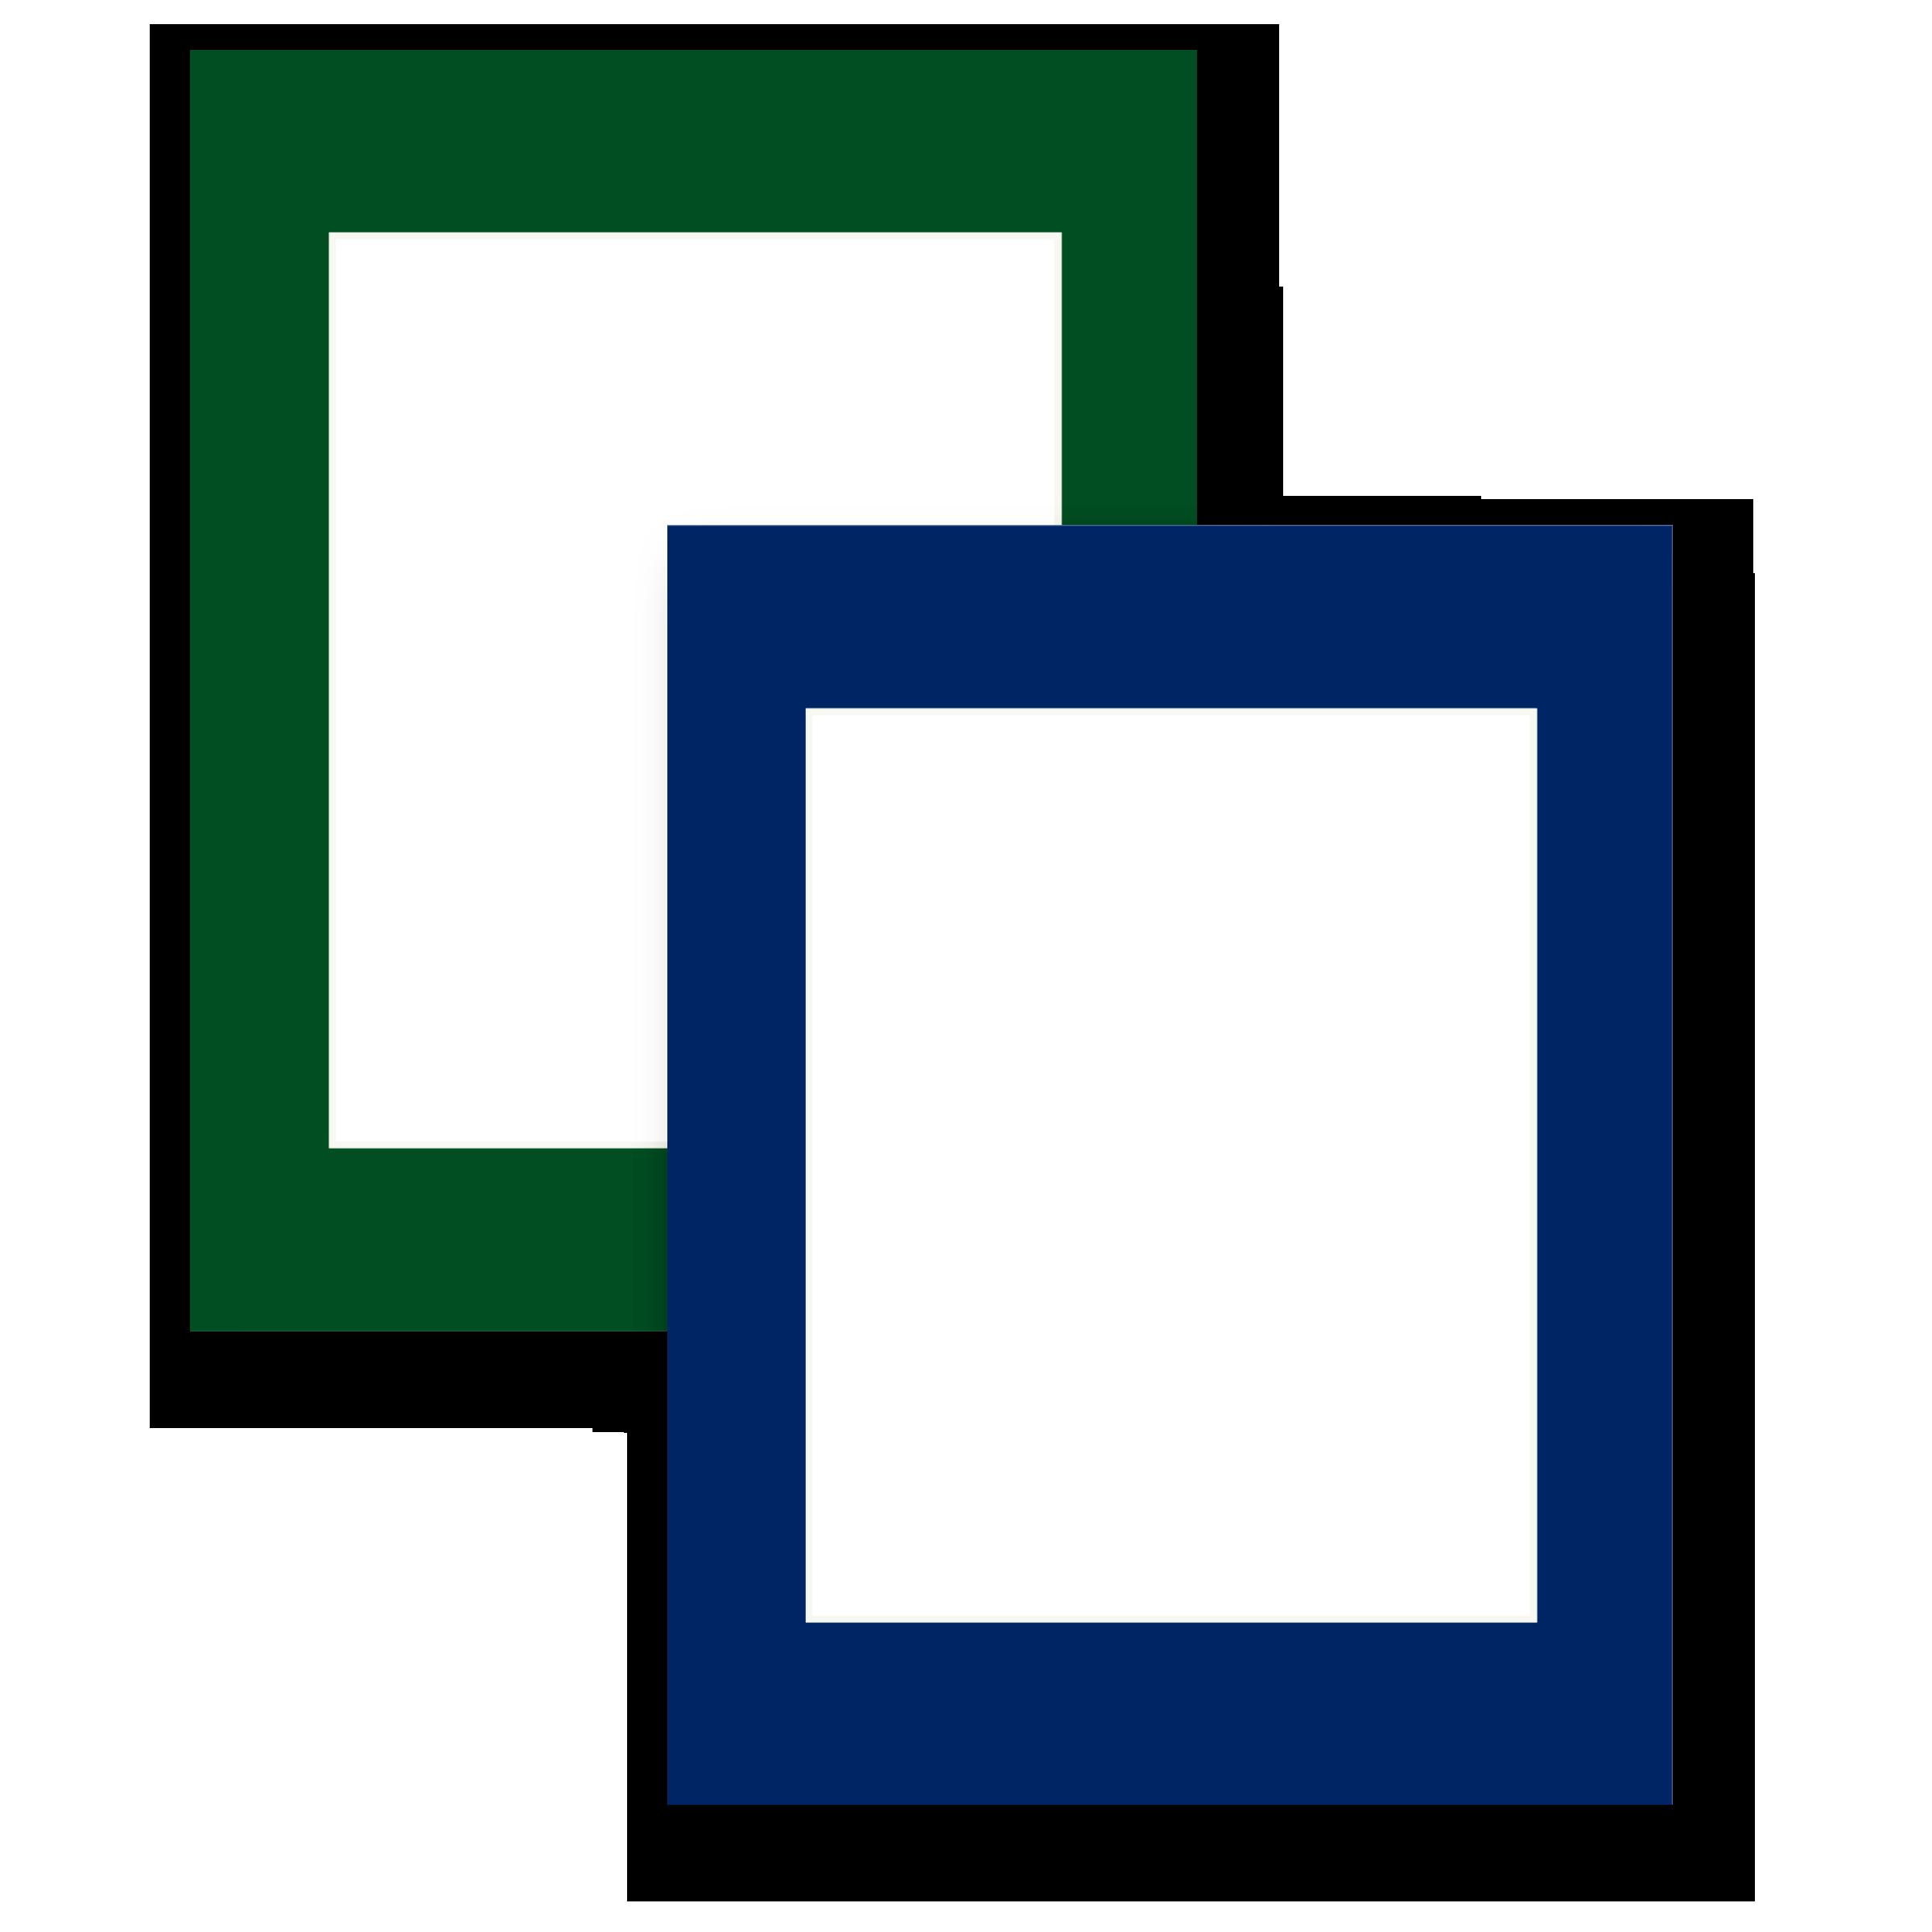 (Choice of Hunter Green or Navy Blue Mat Framing)